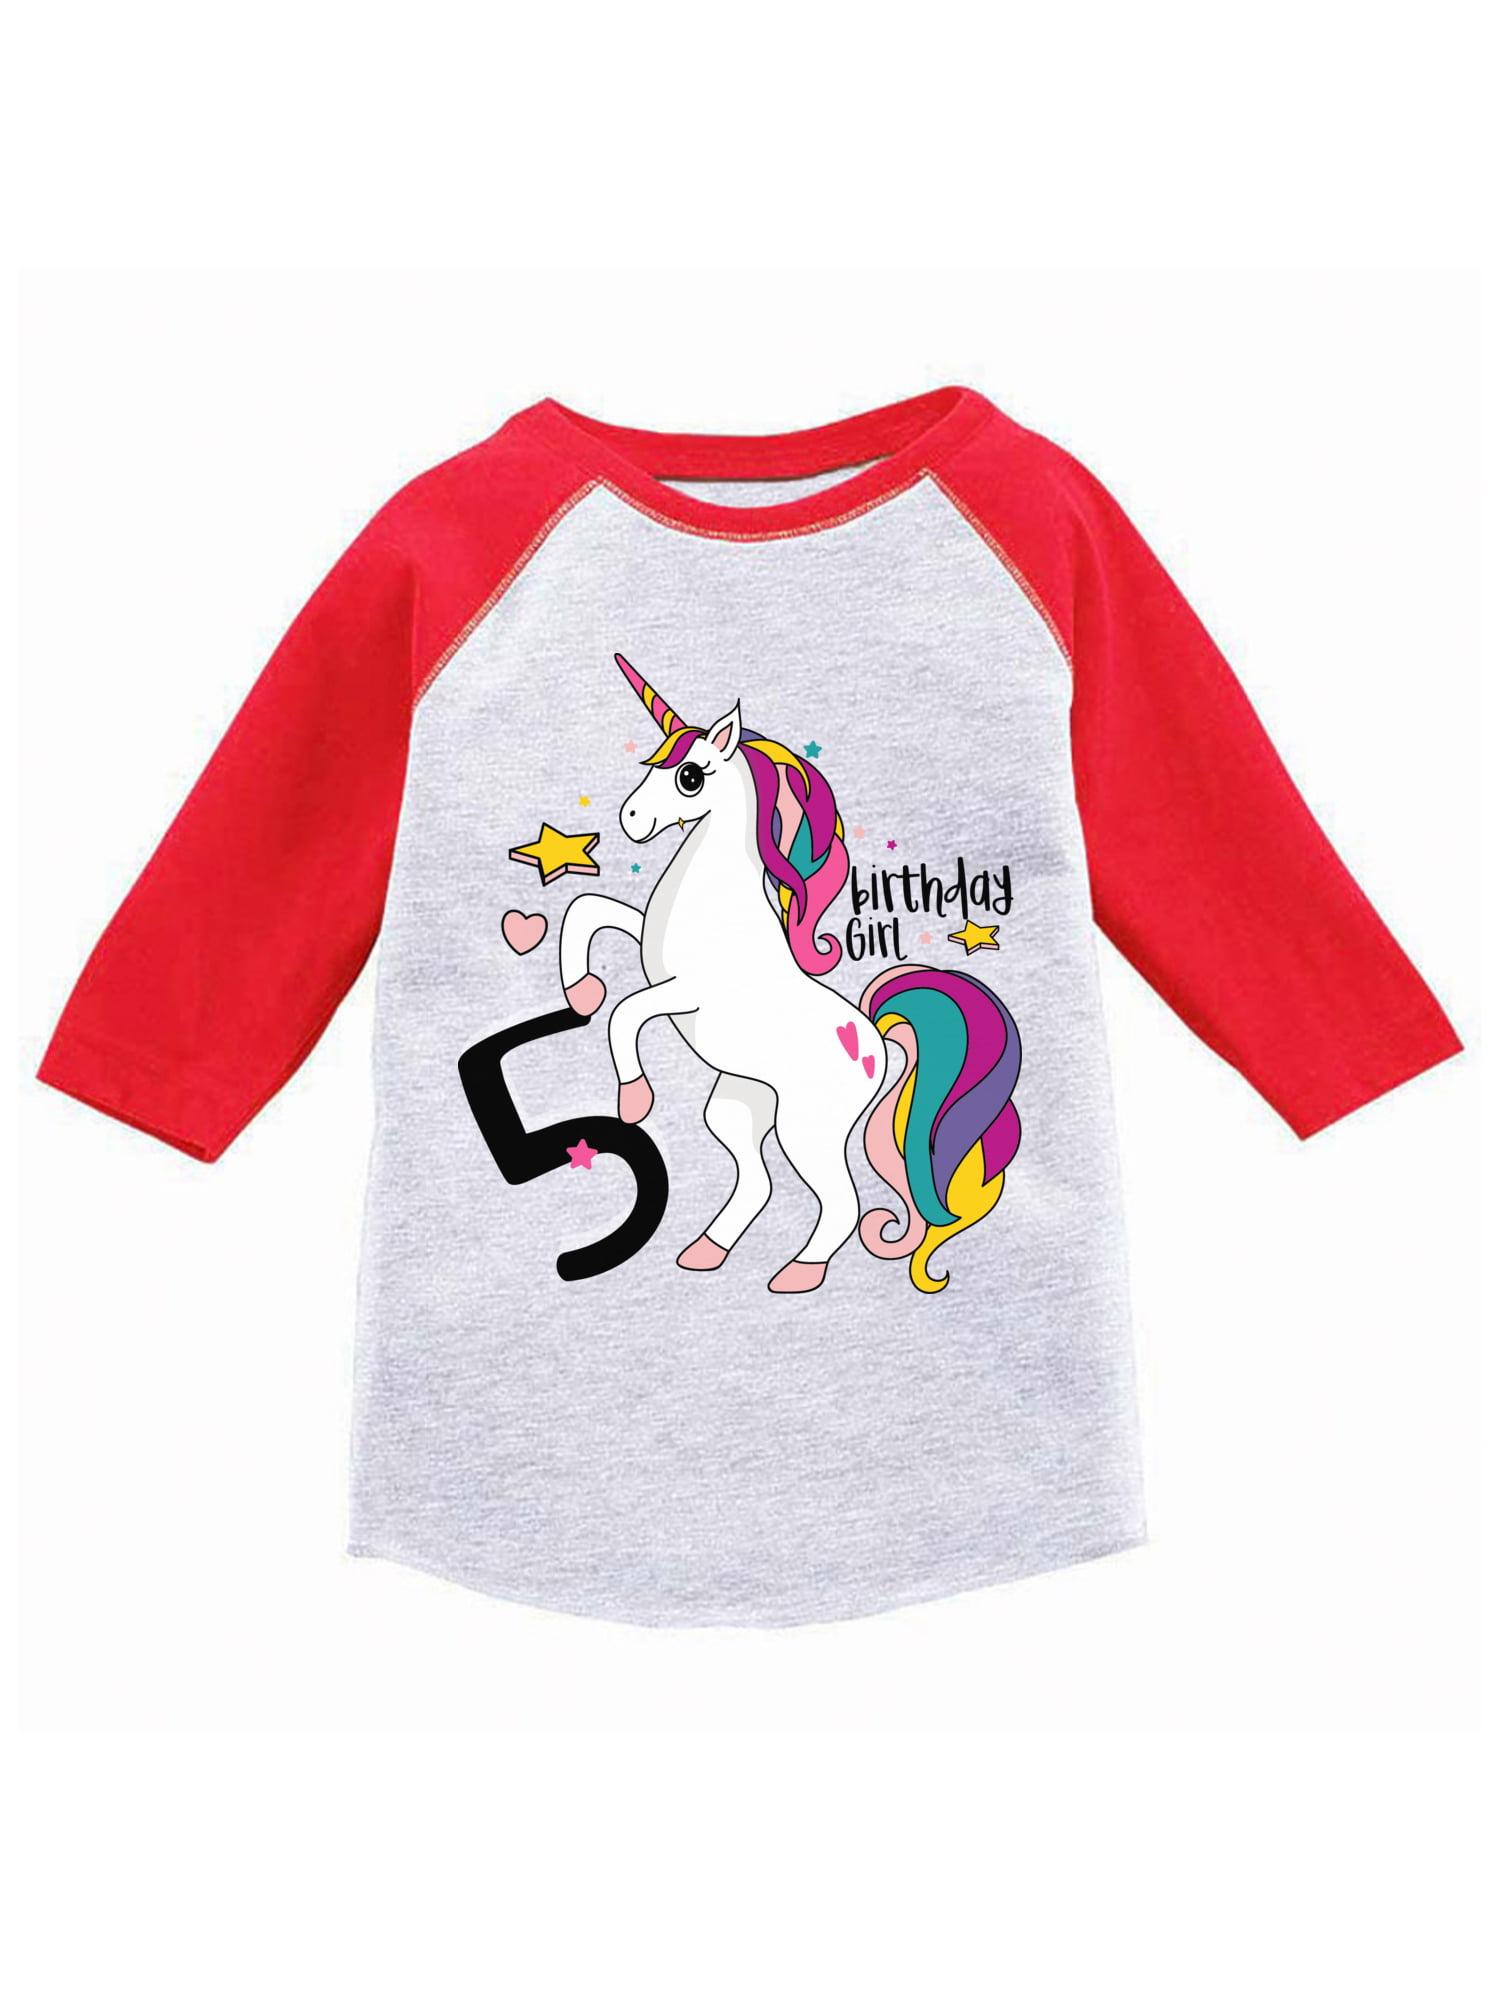 Awkward Styles My 3rd Birthday Long Sleeve Shirt 3 Years Old 3T Birthday Rainbow Toddler T-Shirt 4T